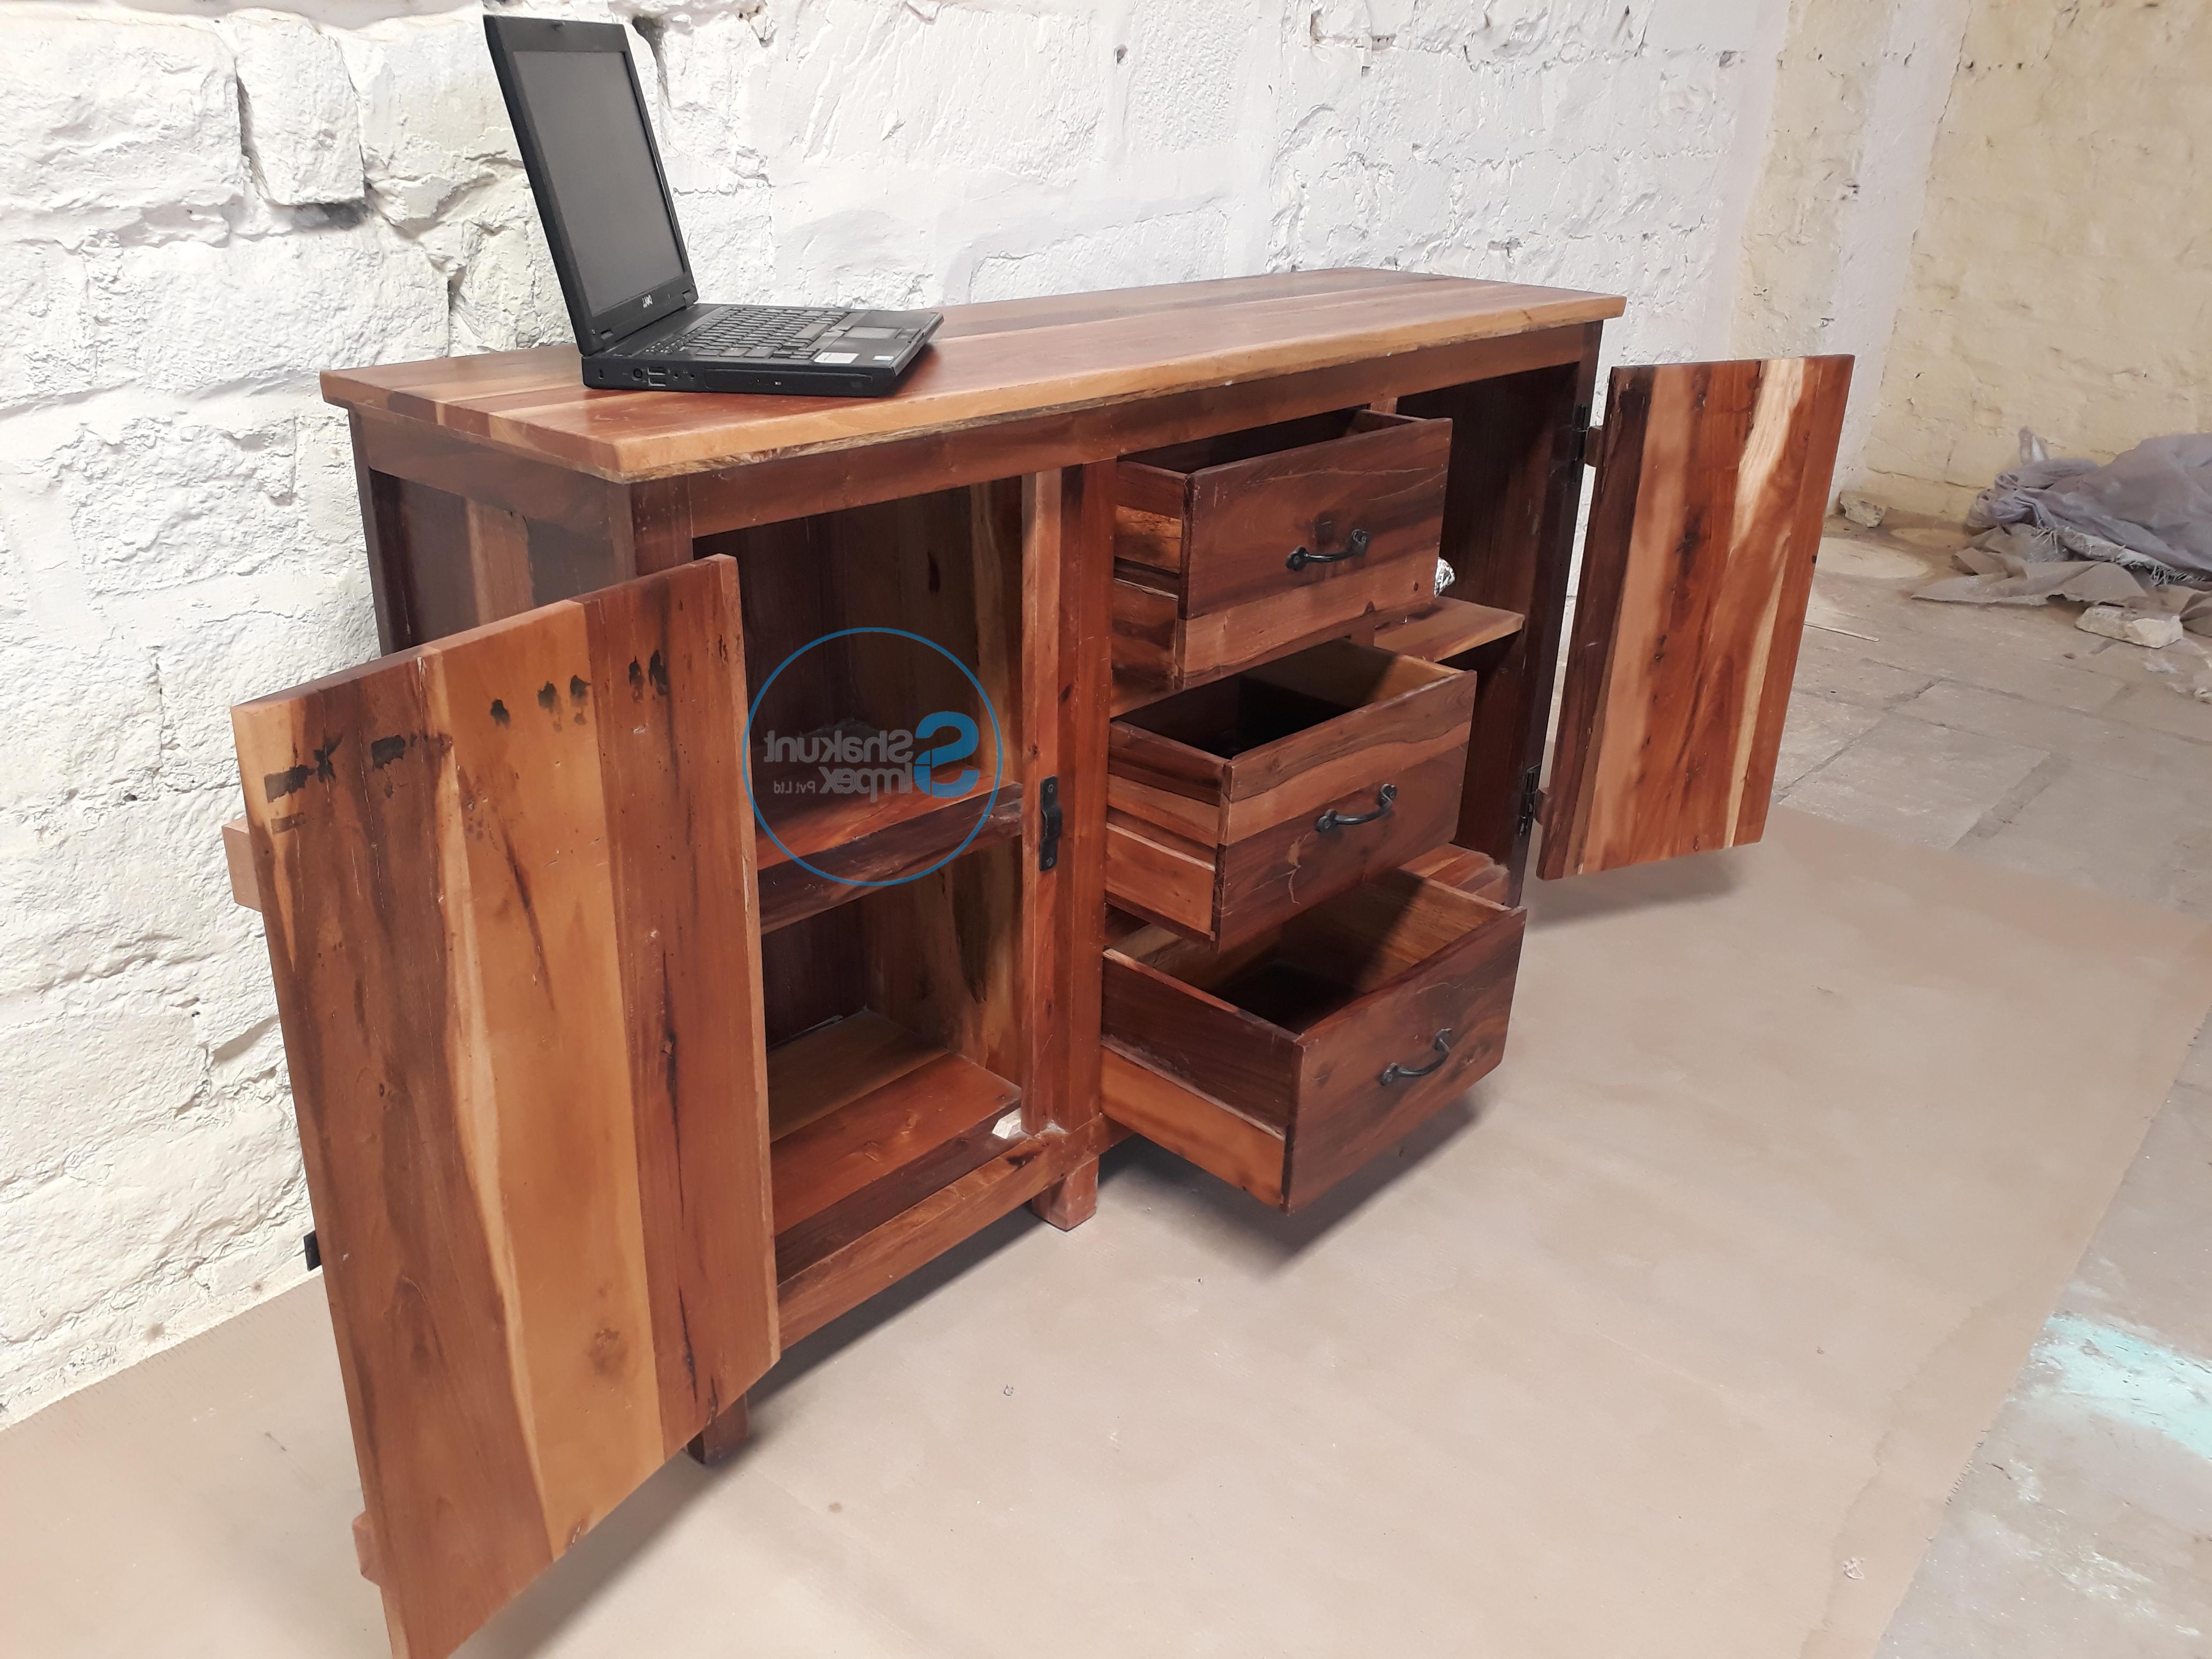 Metal Framed Reclaimed Wood Sideboards Intended For 2019 Handmade Reclaimed Wood Sideboard – Shakunt Vintage Furniture (View 11 of 20)